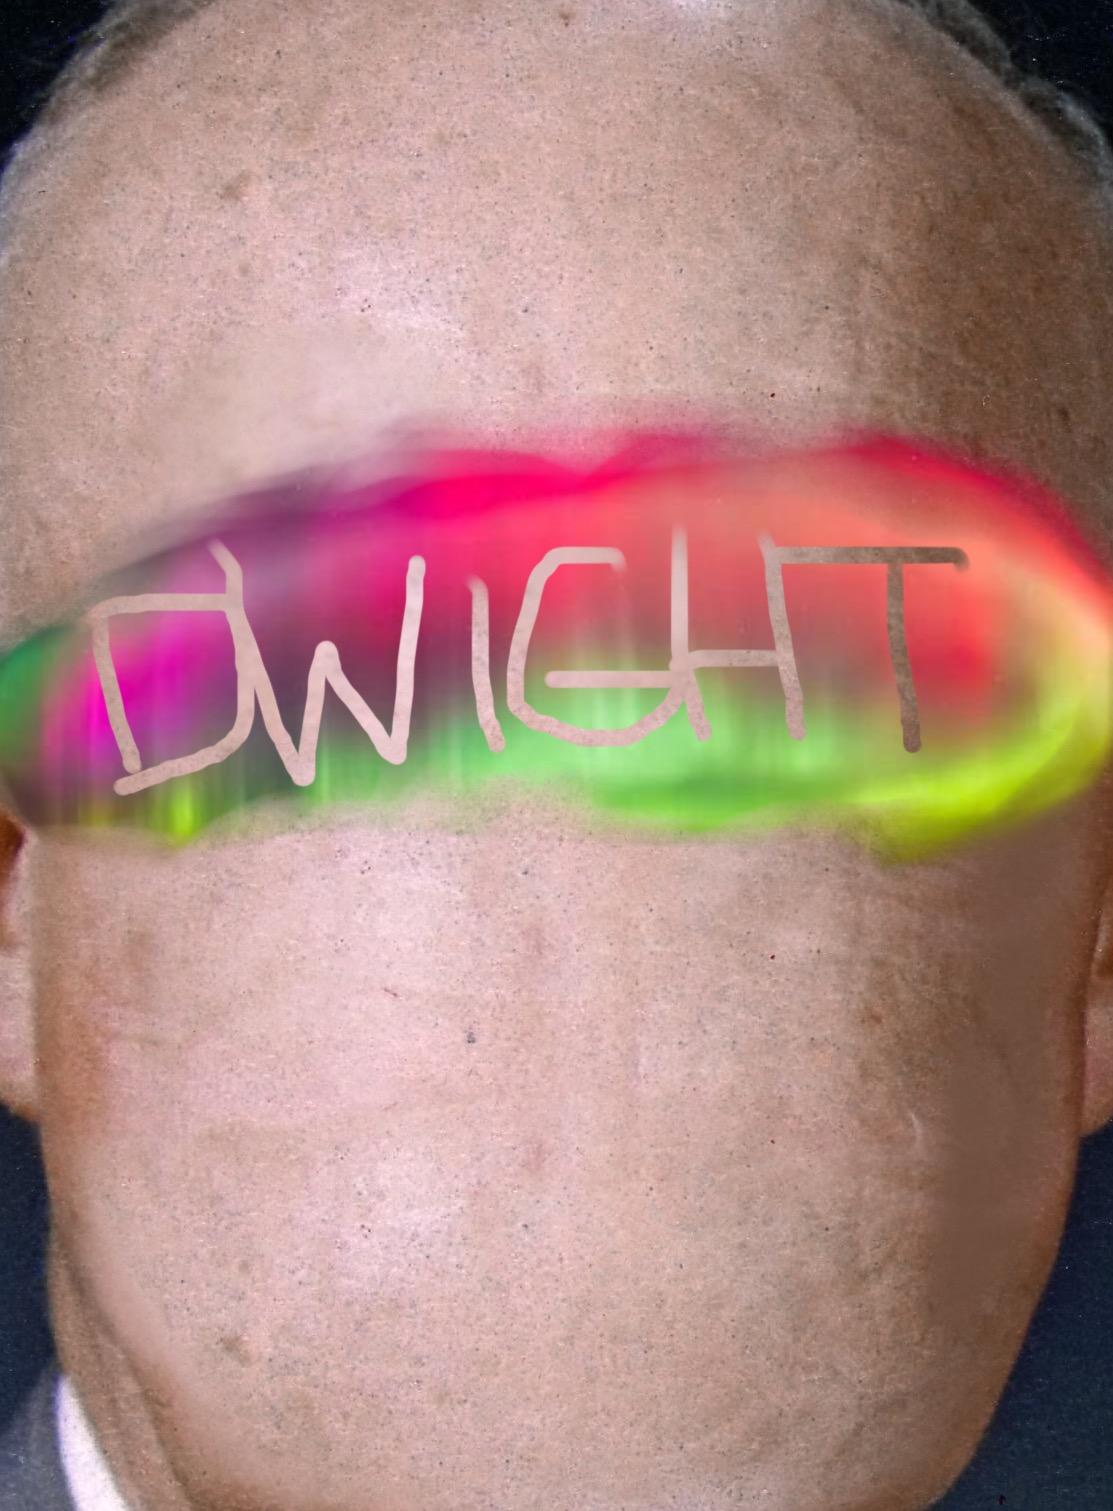 My Man Dwight